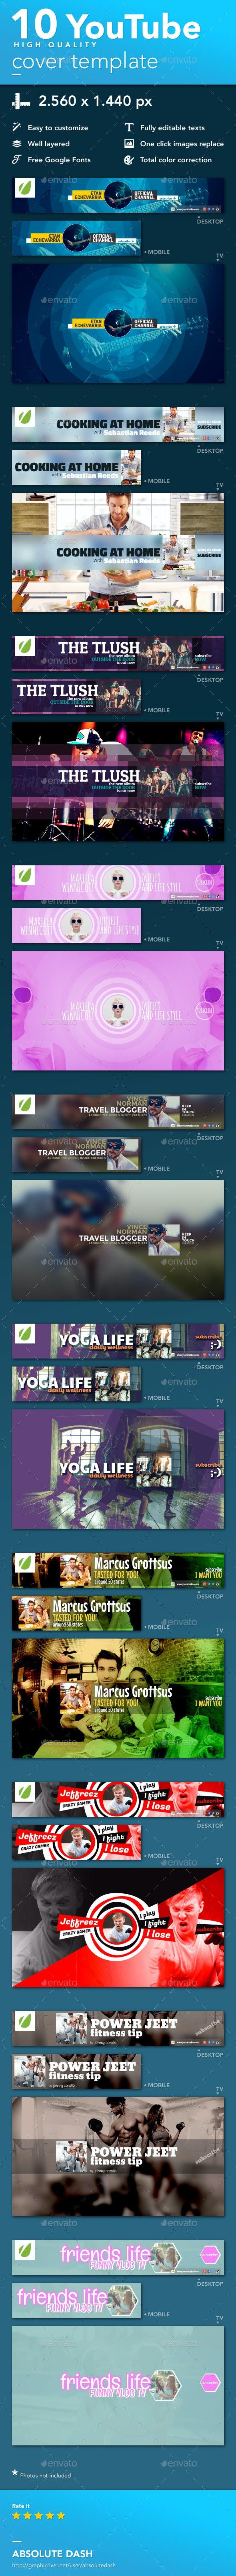 Youtube Cover Template - YouTube Social Media